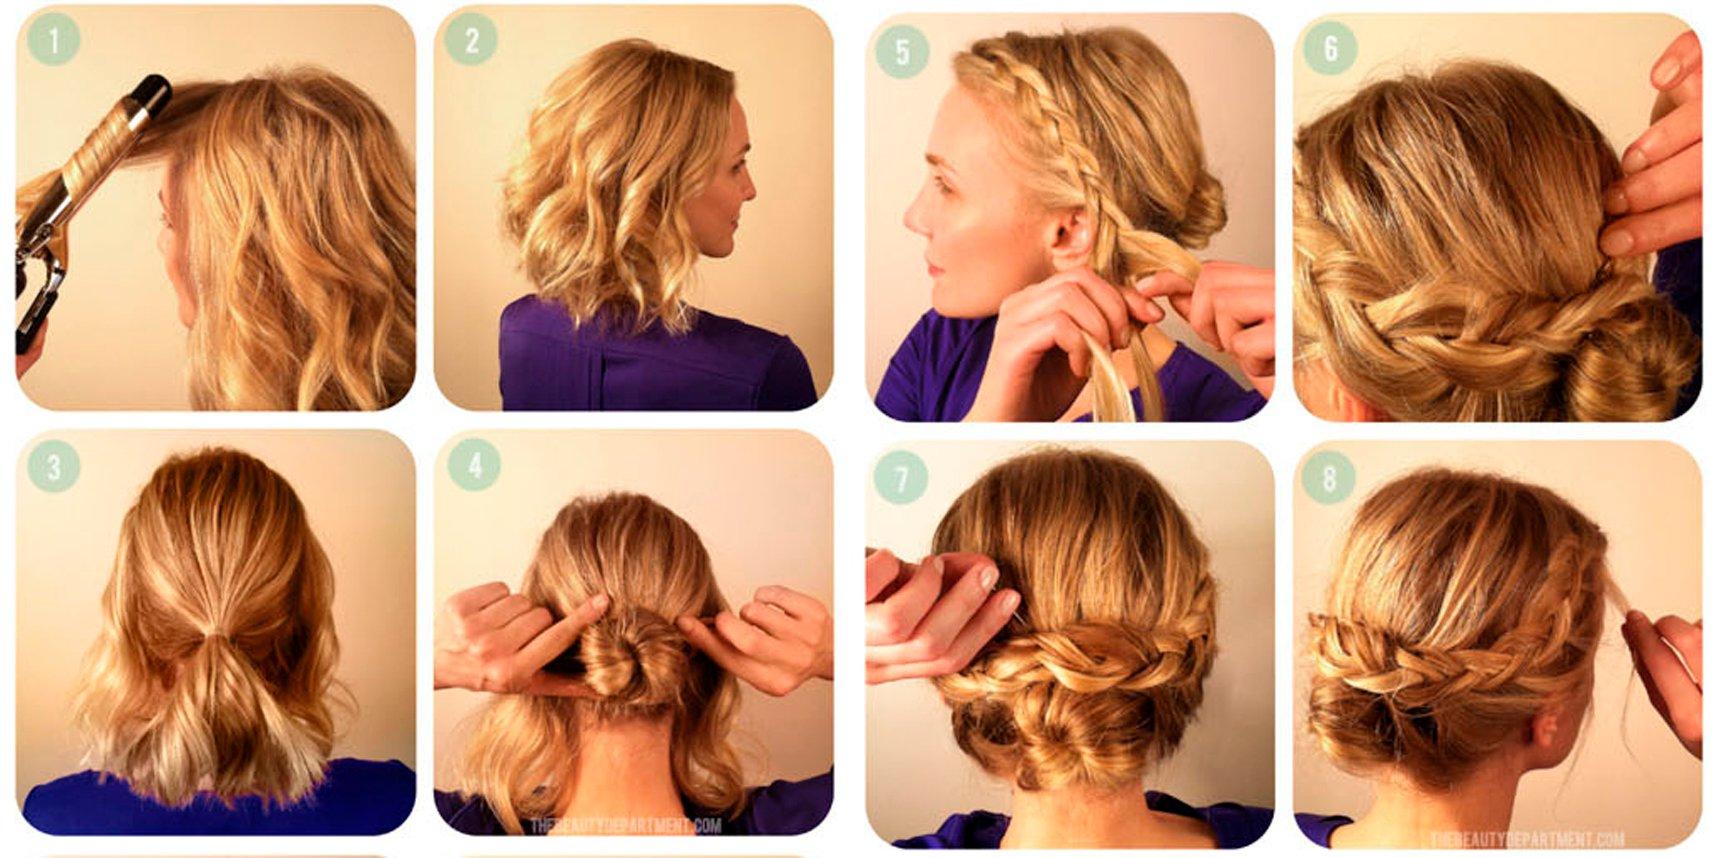 Peinados de fiesta en cabello corto